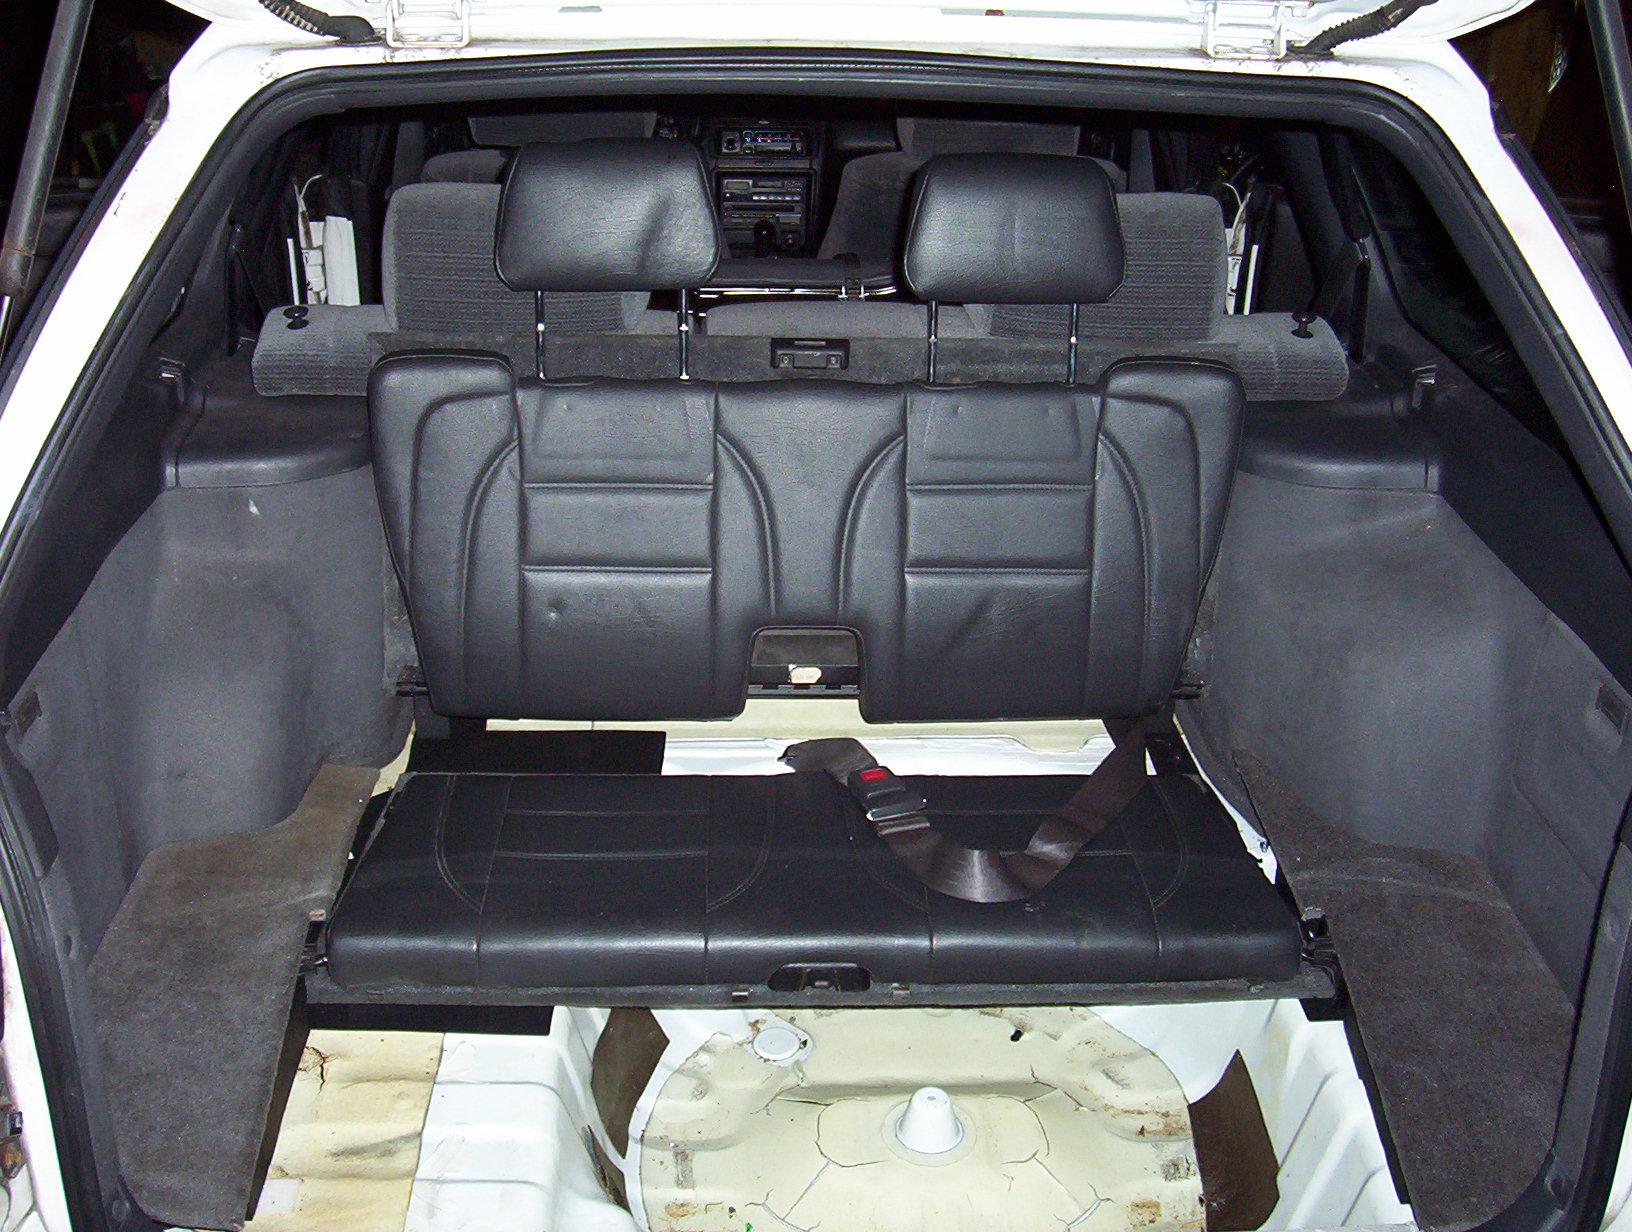 Subaru Legacy or Outback 3rd third row folding seat-seat.jpg